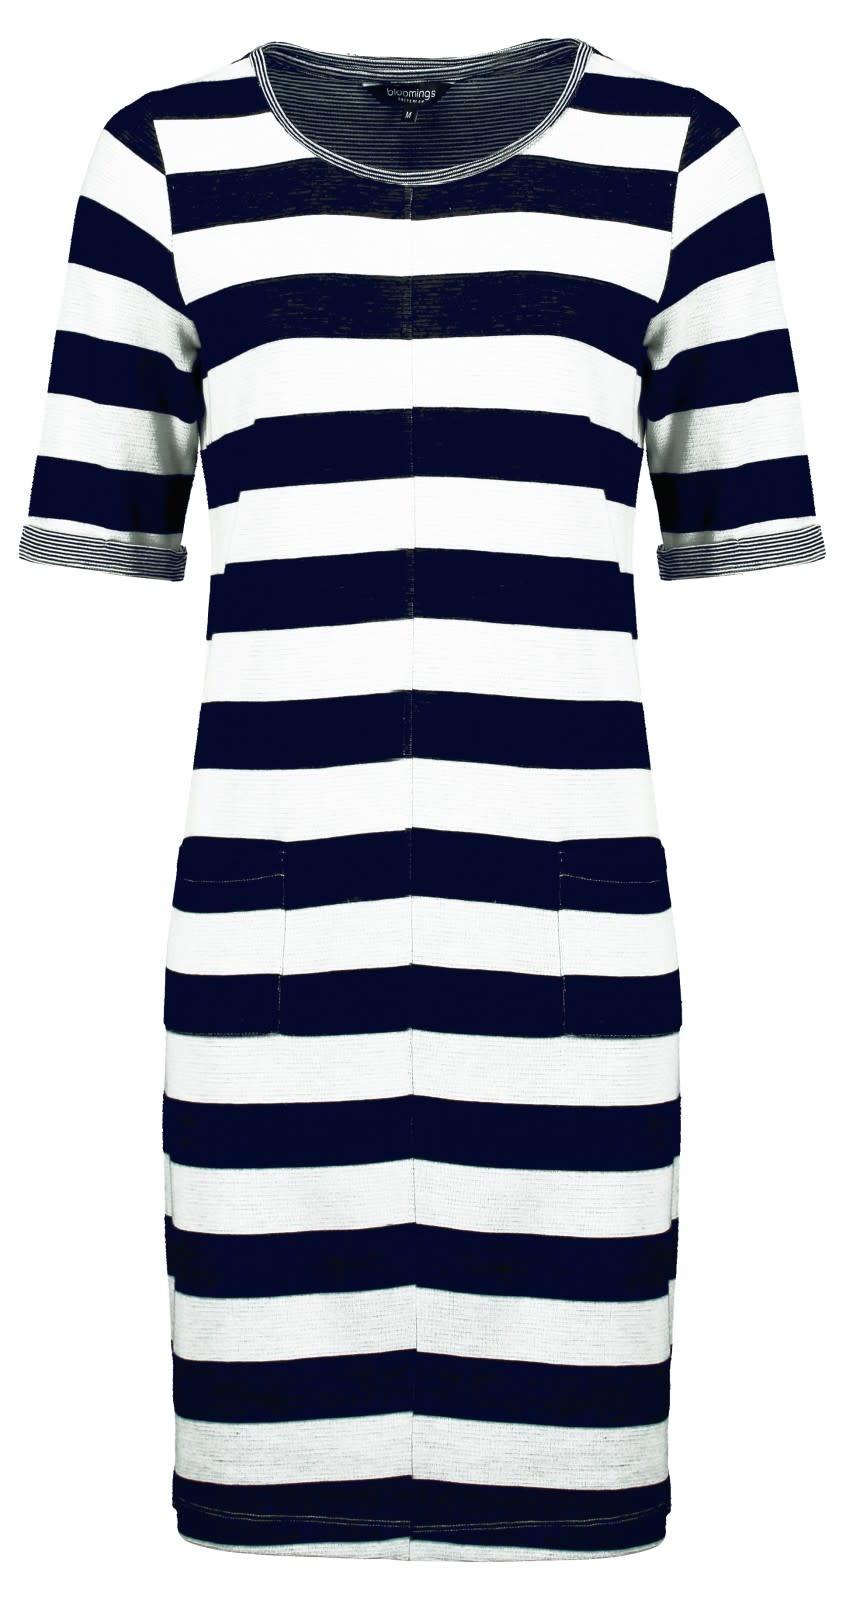 Crew Neck Dress with Navy Melange Stripes